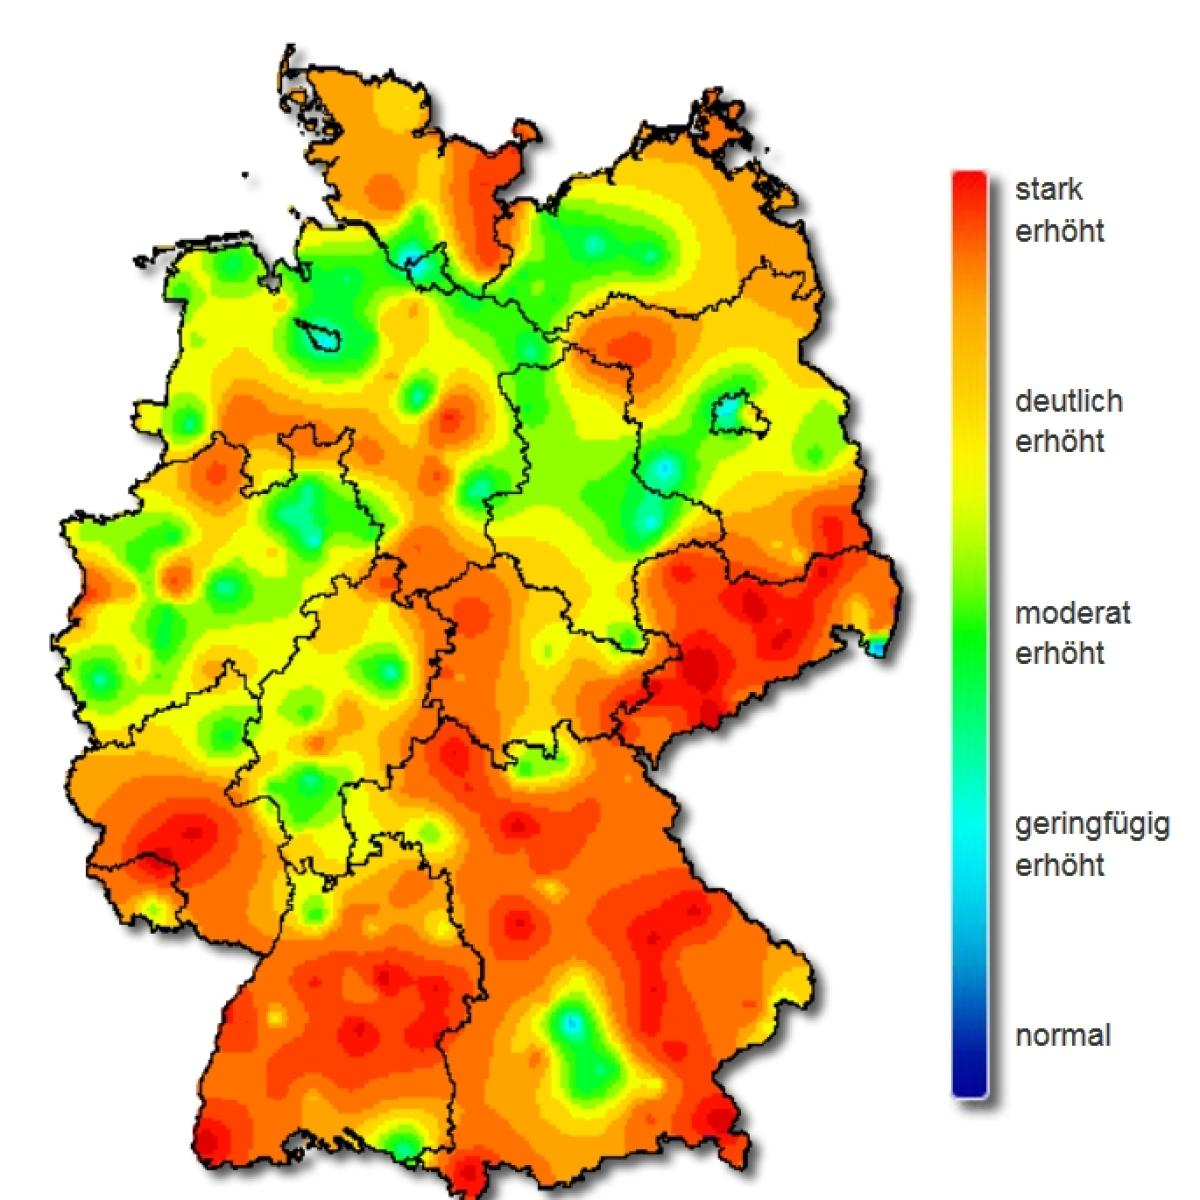 influenza karte Grippe Karte: Bayern stark betroffen: Hier hat die Grippe am  influenza karte